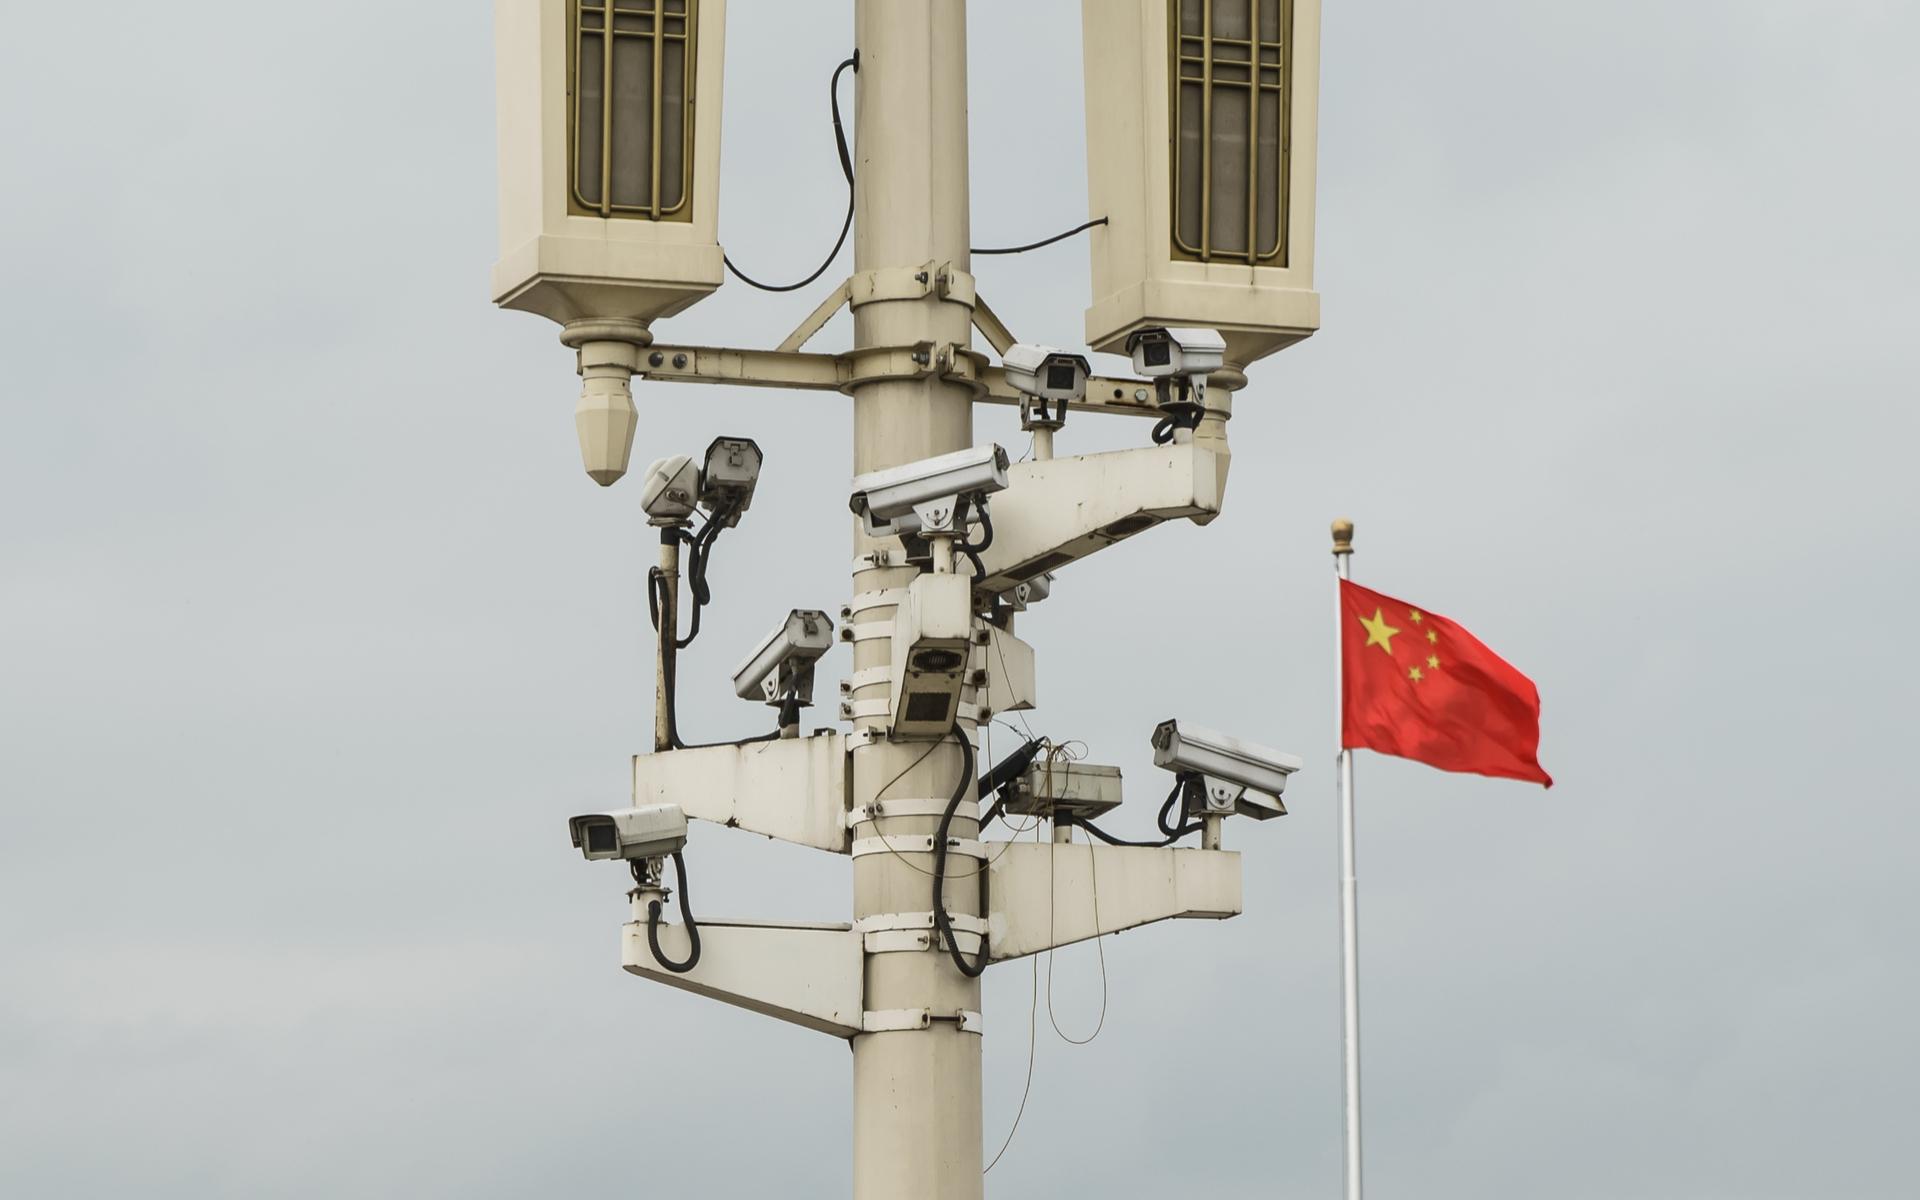 china wechat surveillance bitcoin